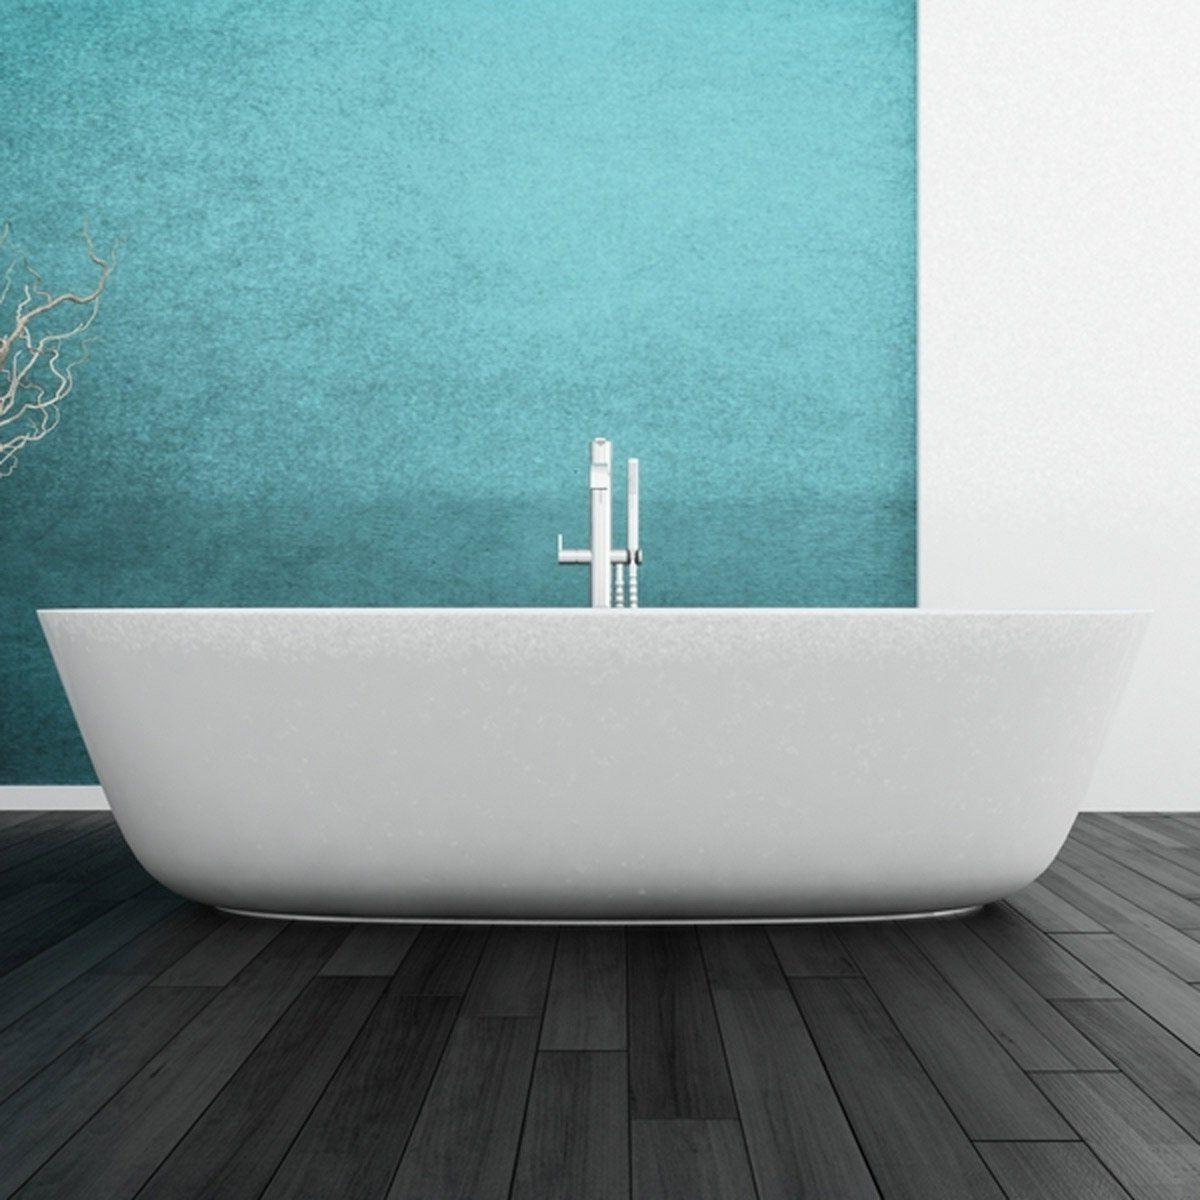 13 Tile Tips for a Better Bathroom | Grab bars, Bathroom tiling and Bar